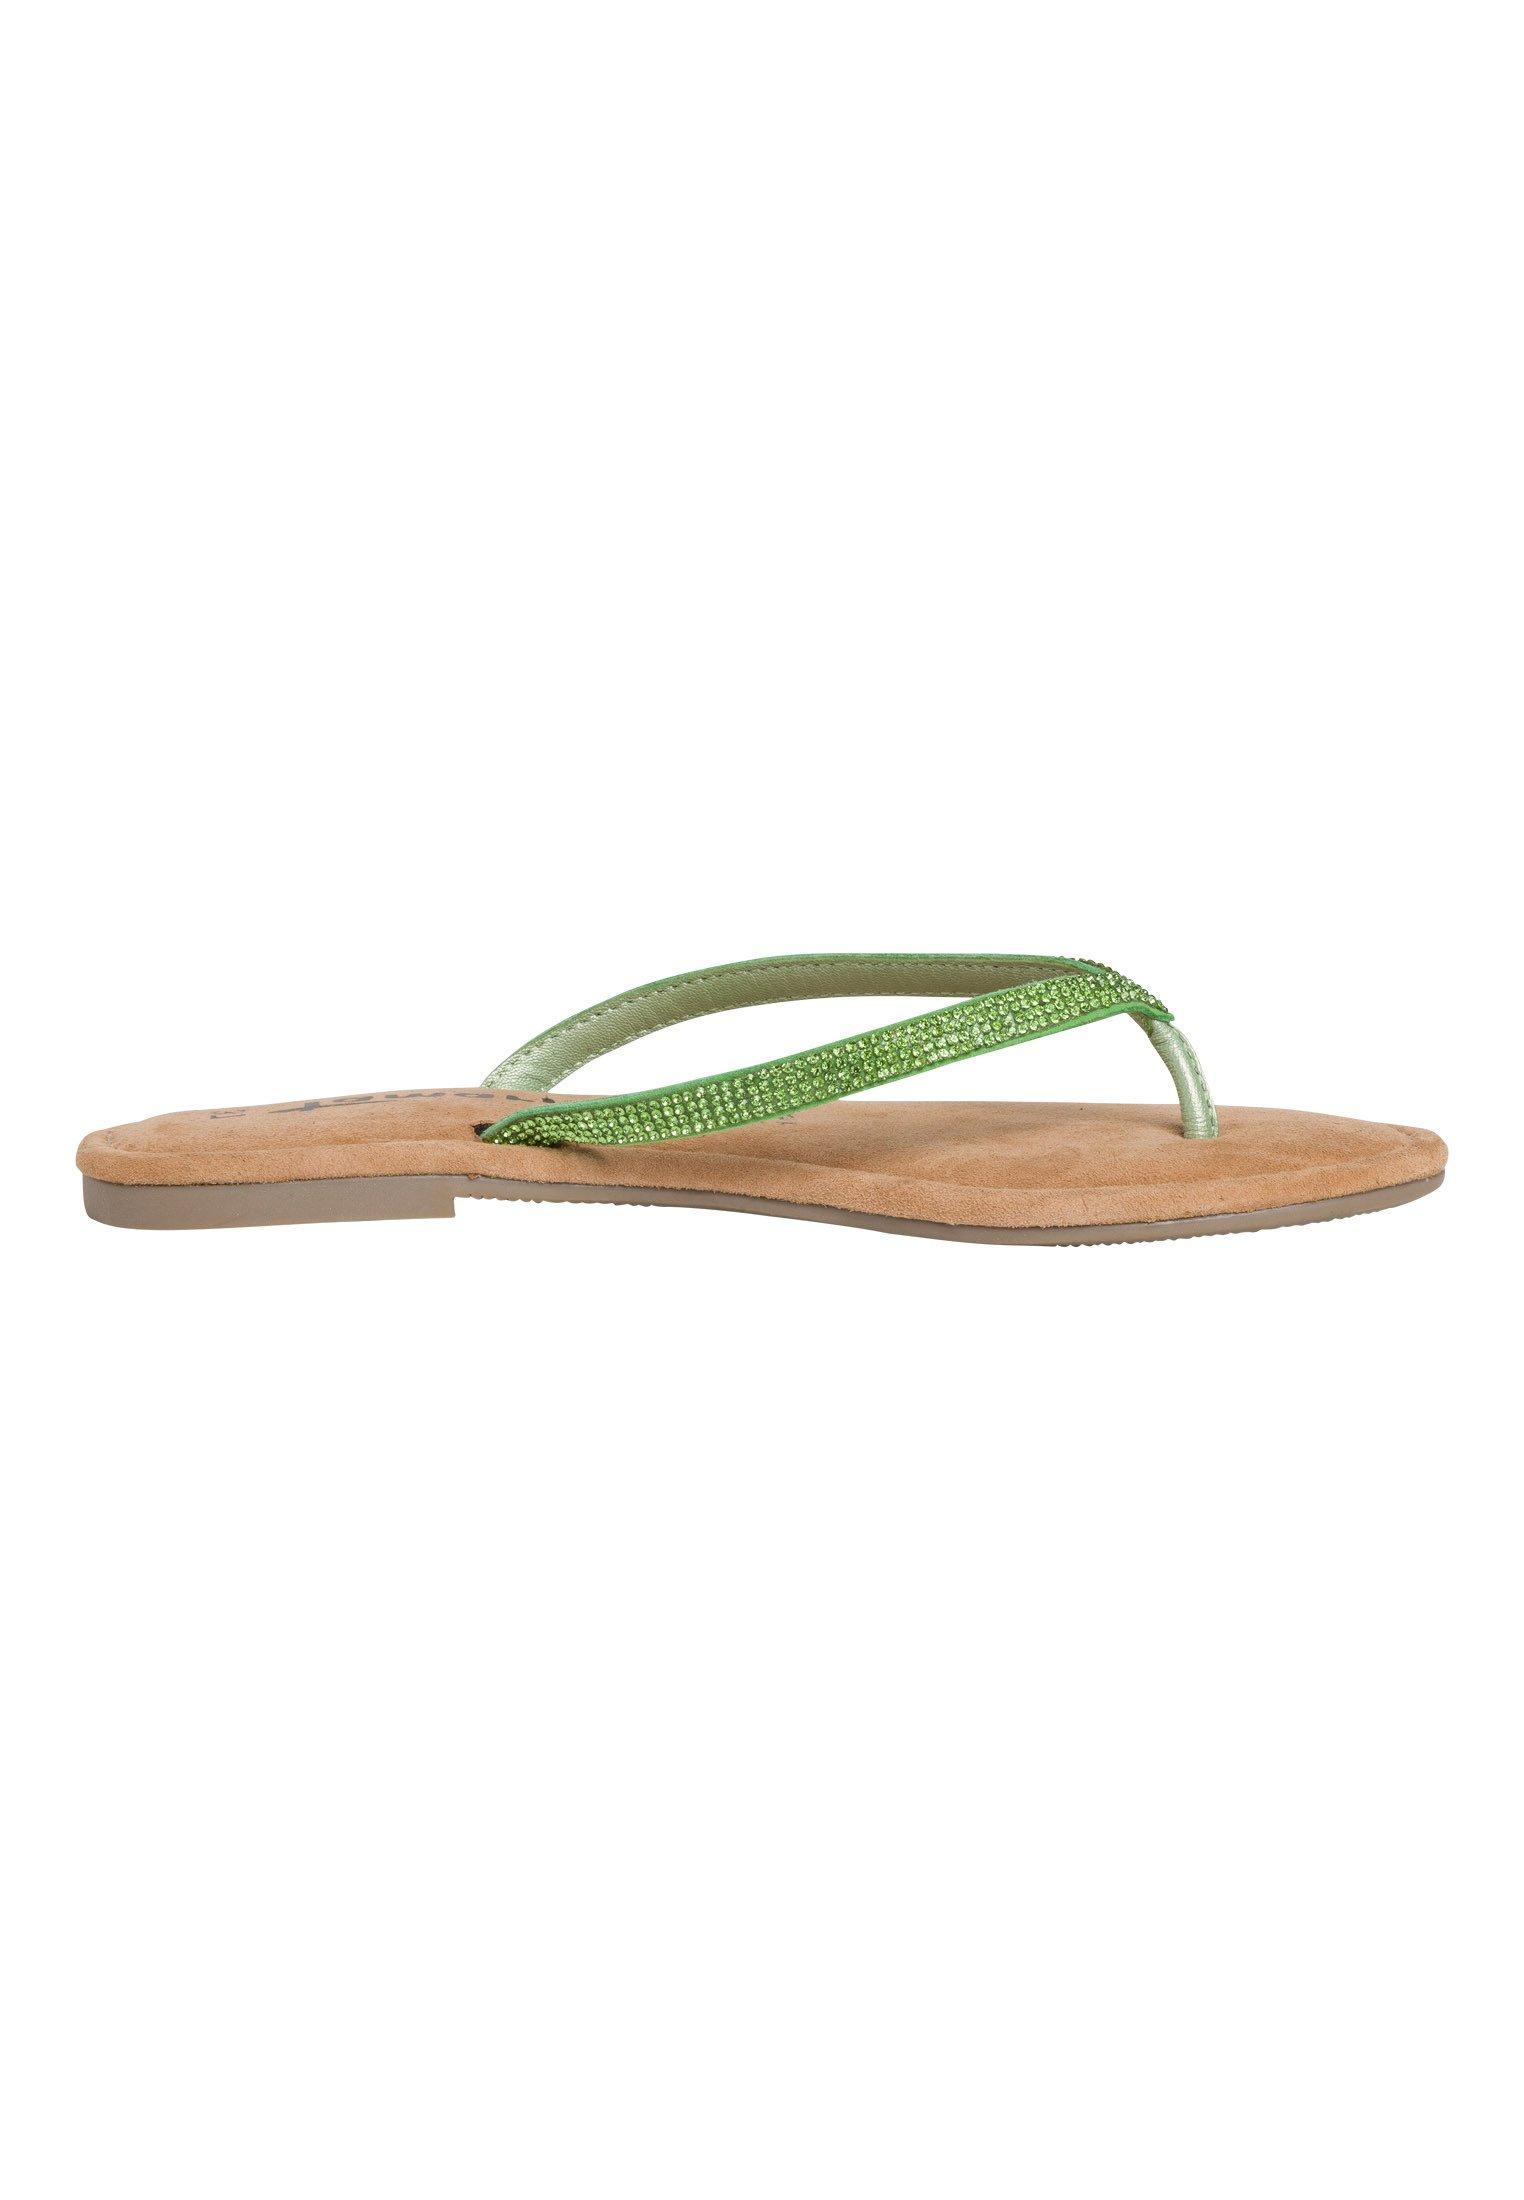 Tamaris TAMARIS ZEHENTRENNER - T-bar sandals - green